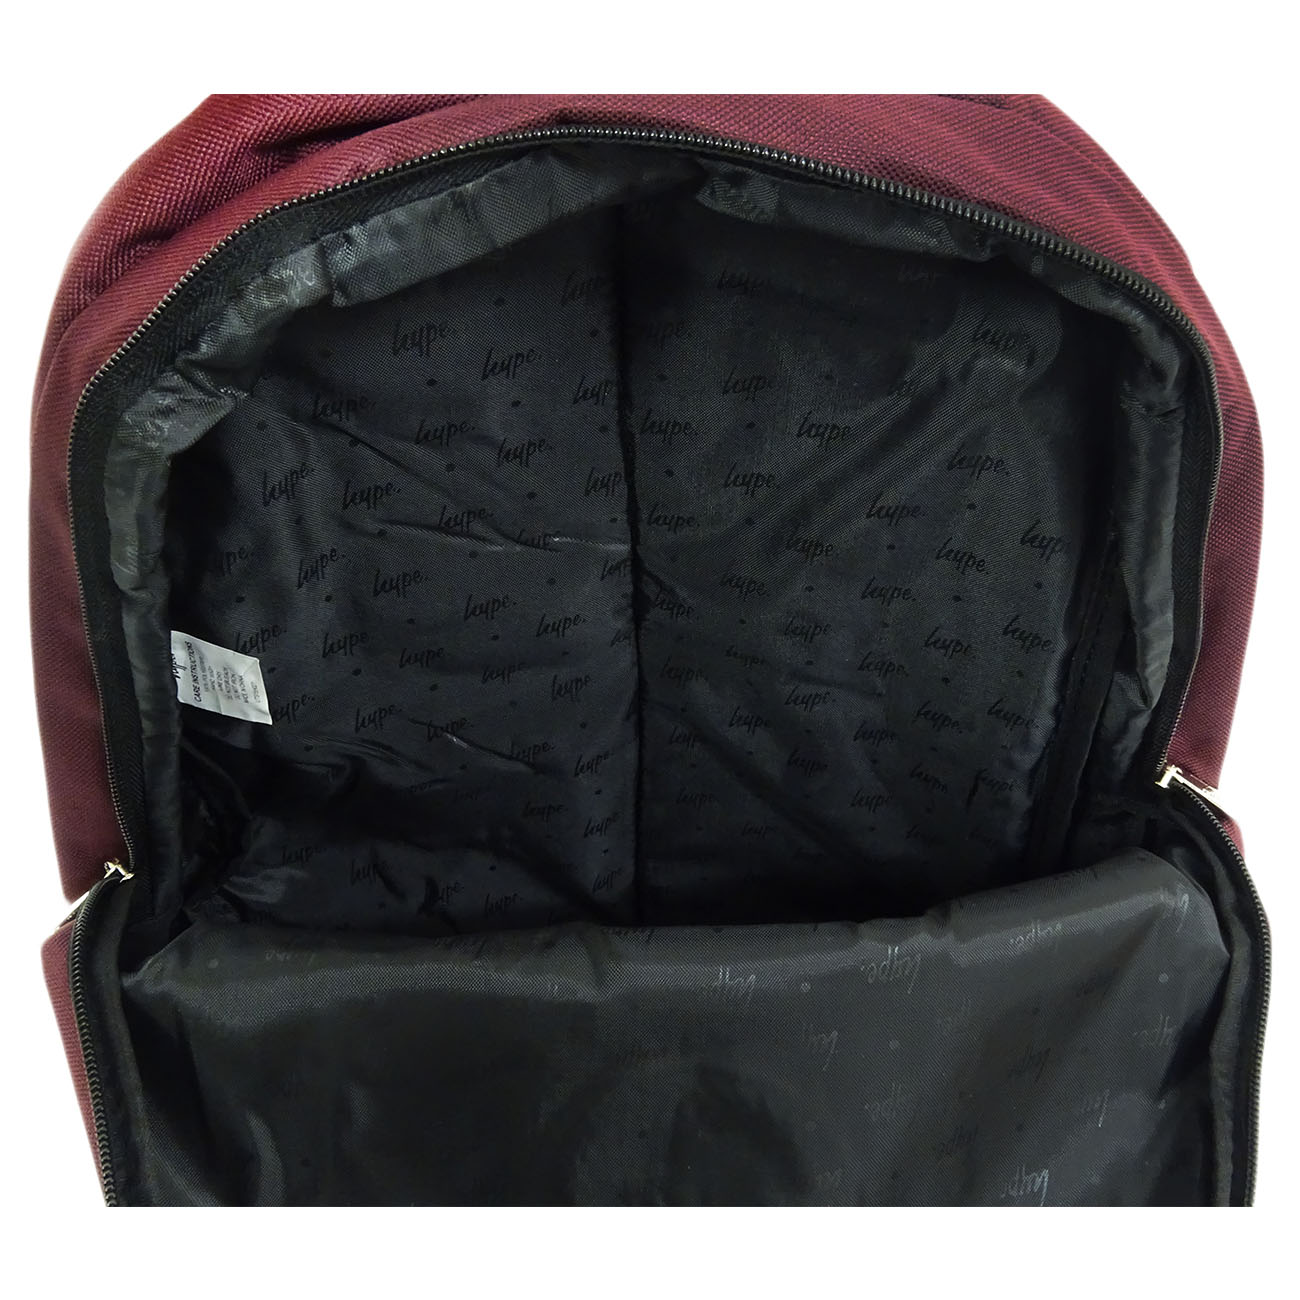 Unisexe-Hype-Sac-A-Dos-Ecole-Gym-SACS-pochettes-pencil-case miniature 151